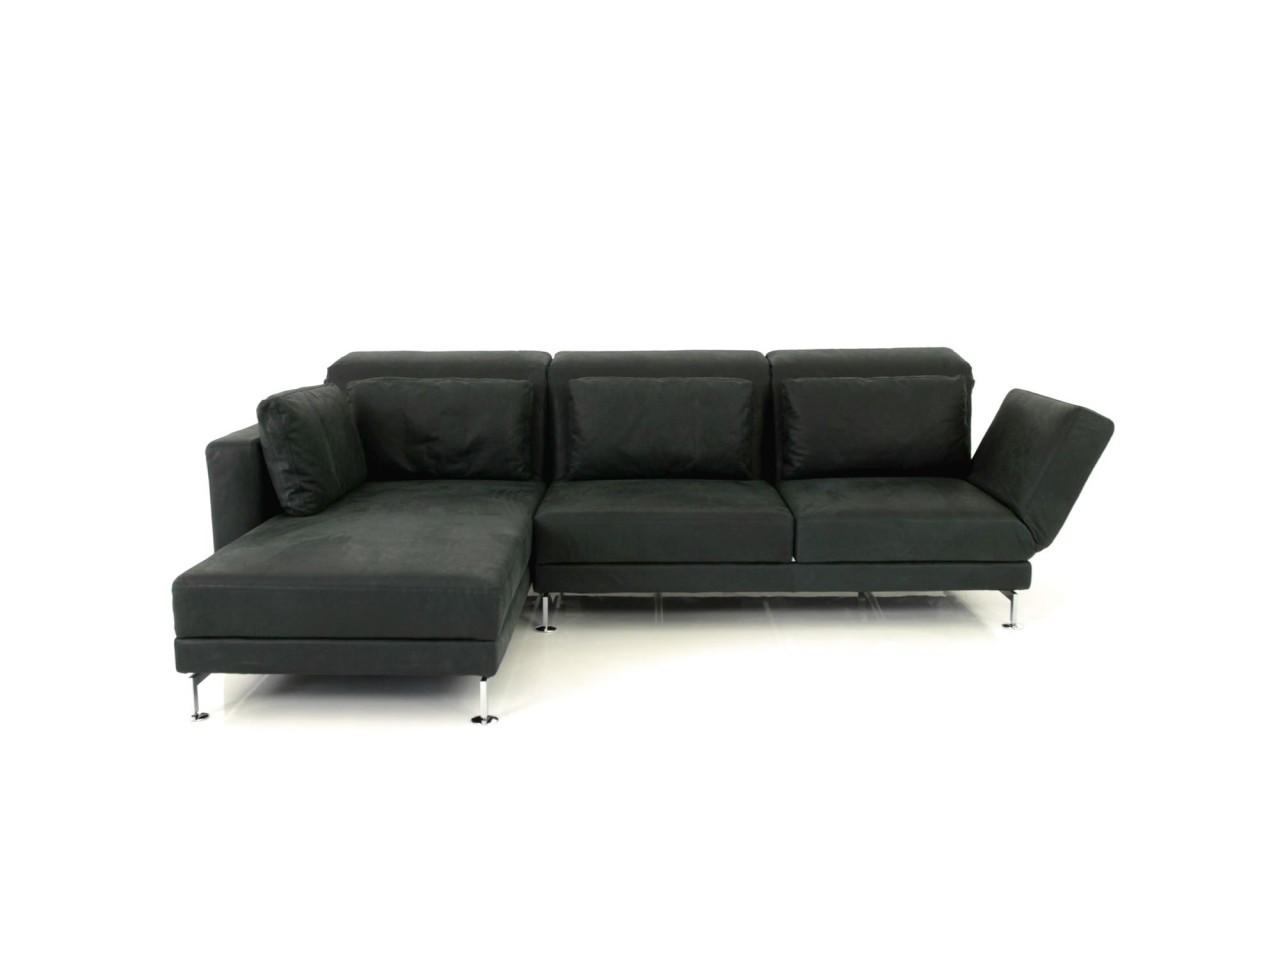 Brühl MOULE MEDIUM Sofa mit Recamiere links im schwarzen Leder GLOVE